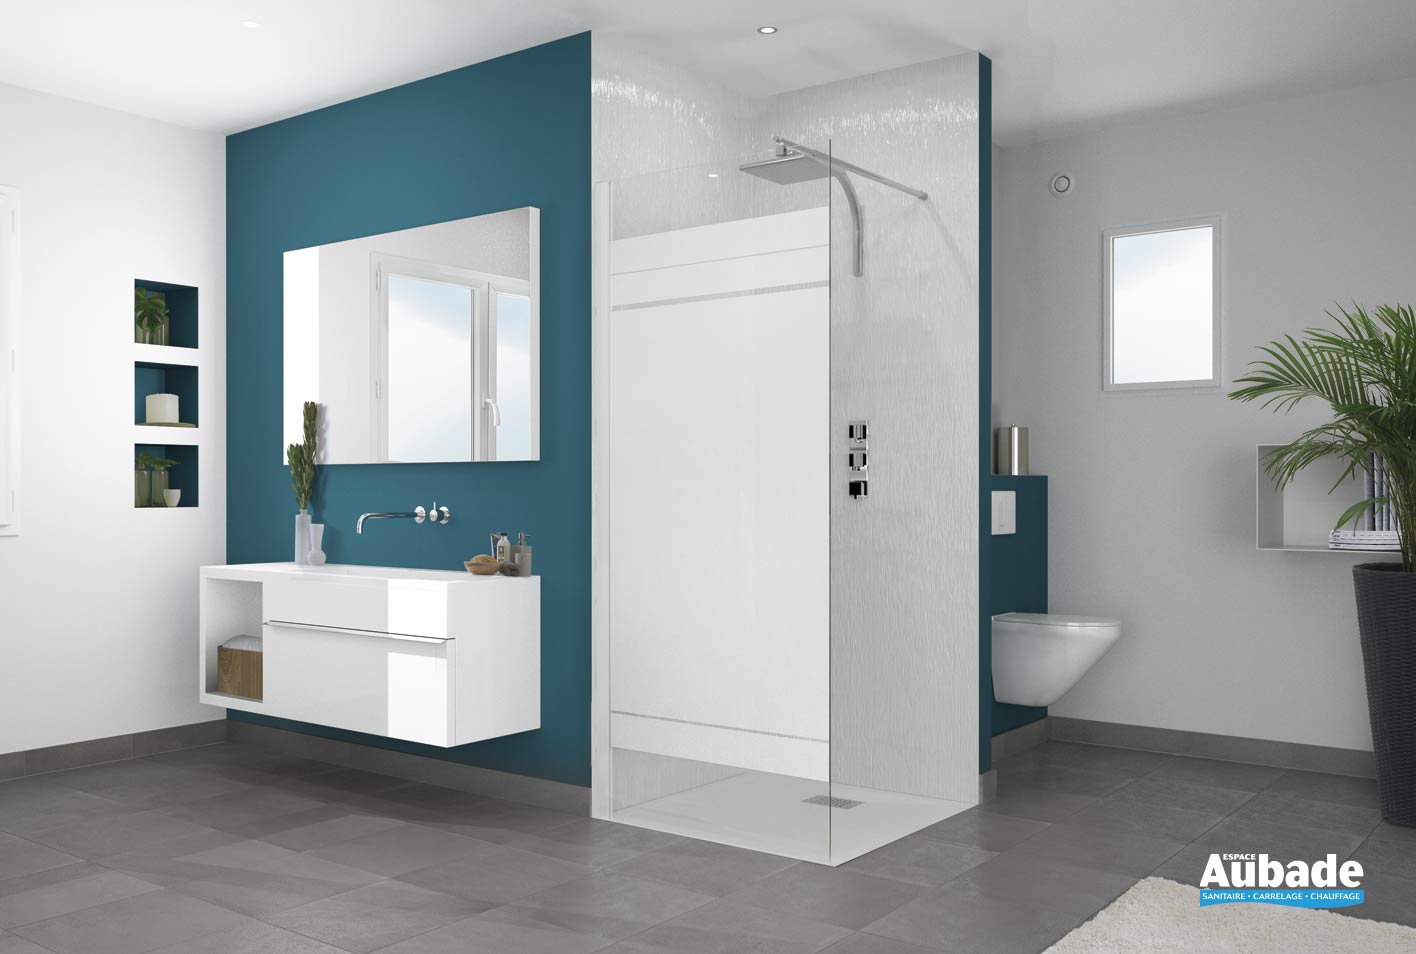 paroi de douche ouverte kinedo smart solo espace aubade. Black Bedroom Furniture Sets. Home Design Ideas